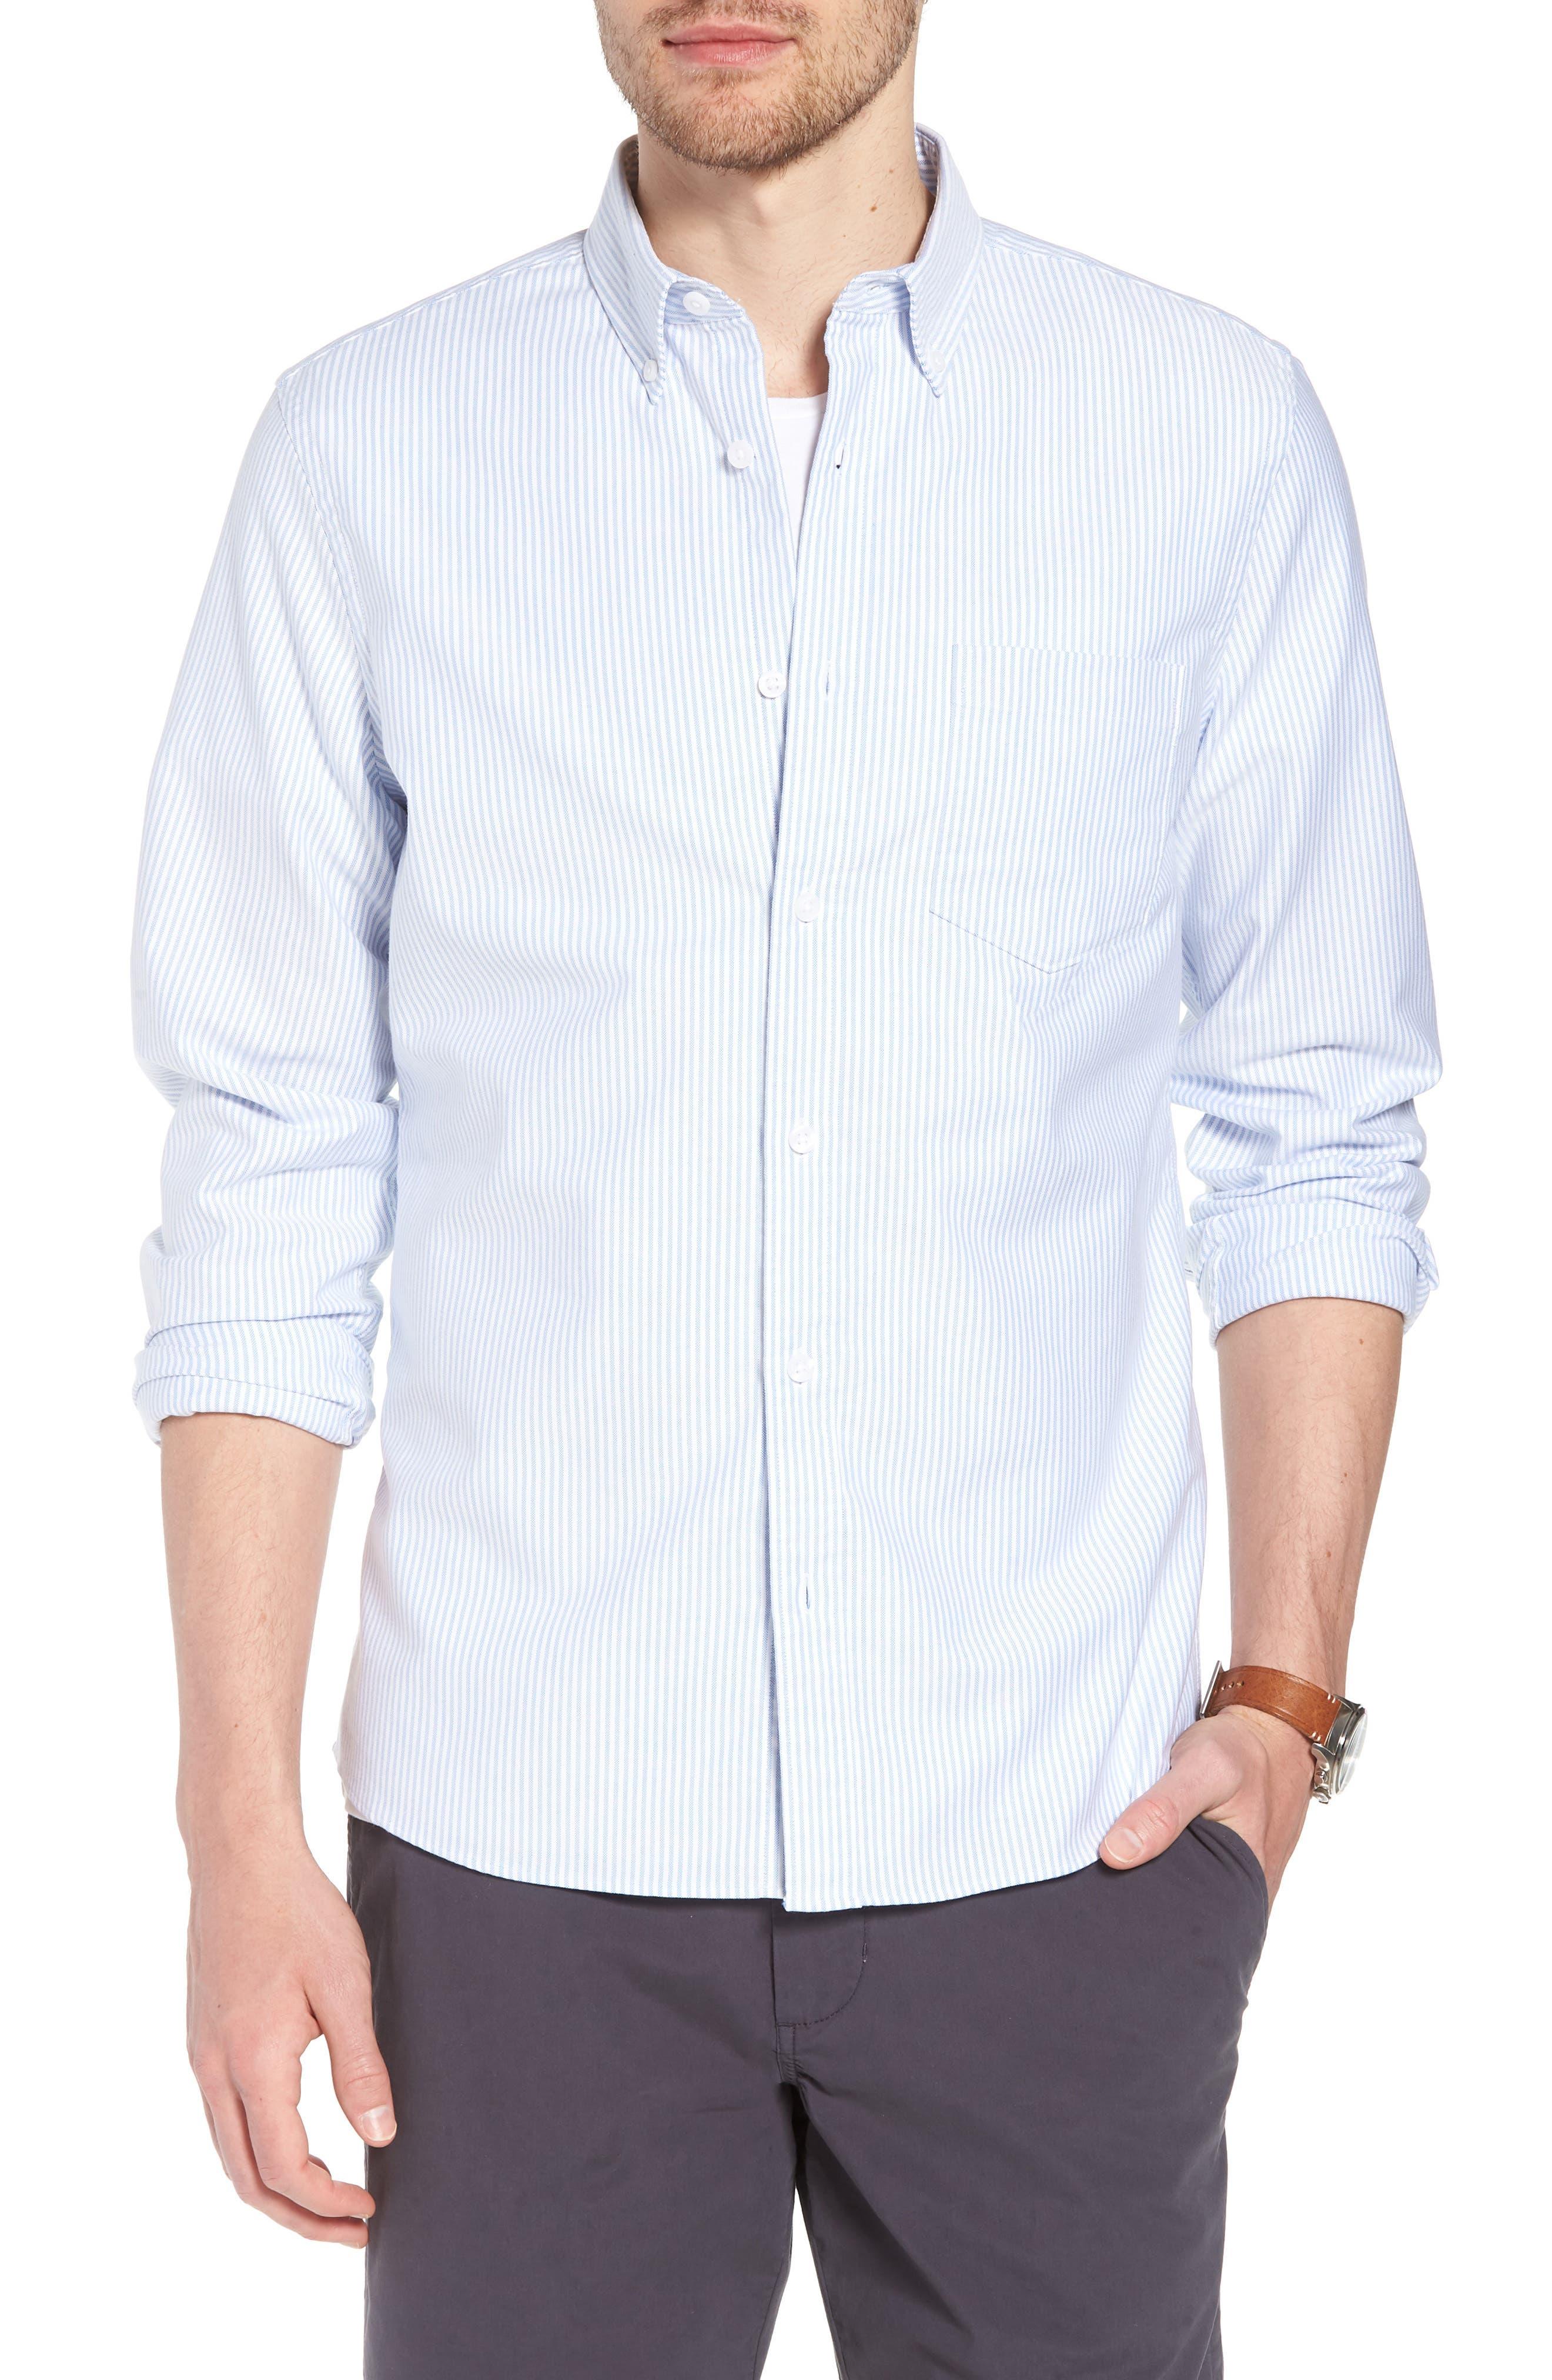 Trim Fit Bengal Stripe Sport Shirt,                         Main,                         color, Blue White Bengal Stripe